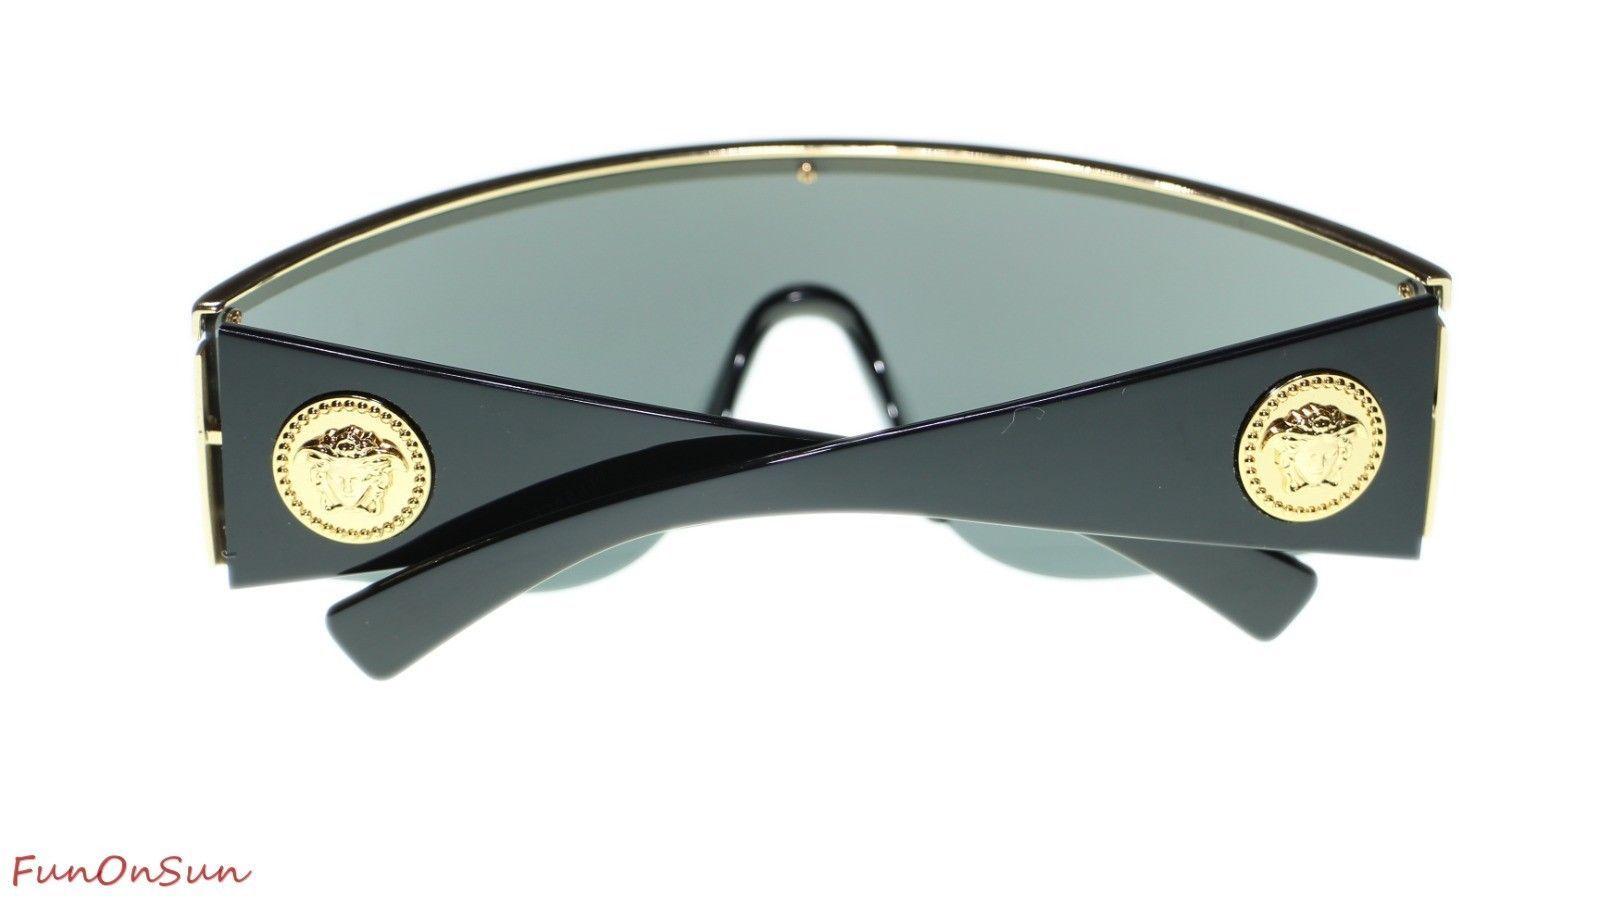 fb1aa00c746 Versace Unisex Sunglasses VE2197 10006G Gold Grey Mirror Silver Lens 40mm